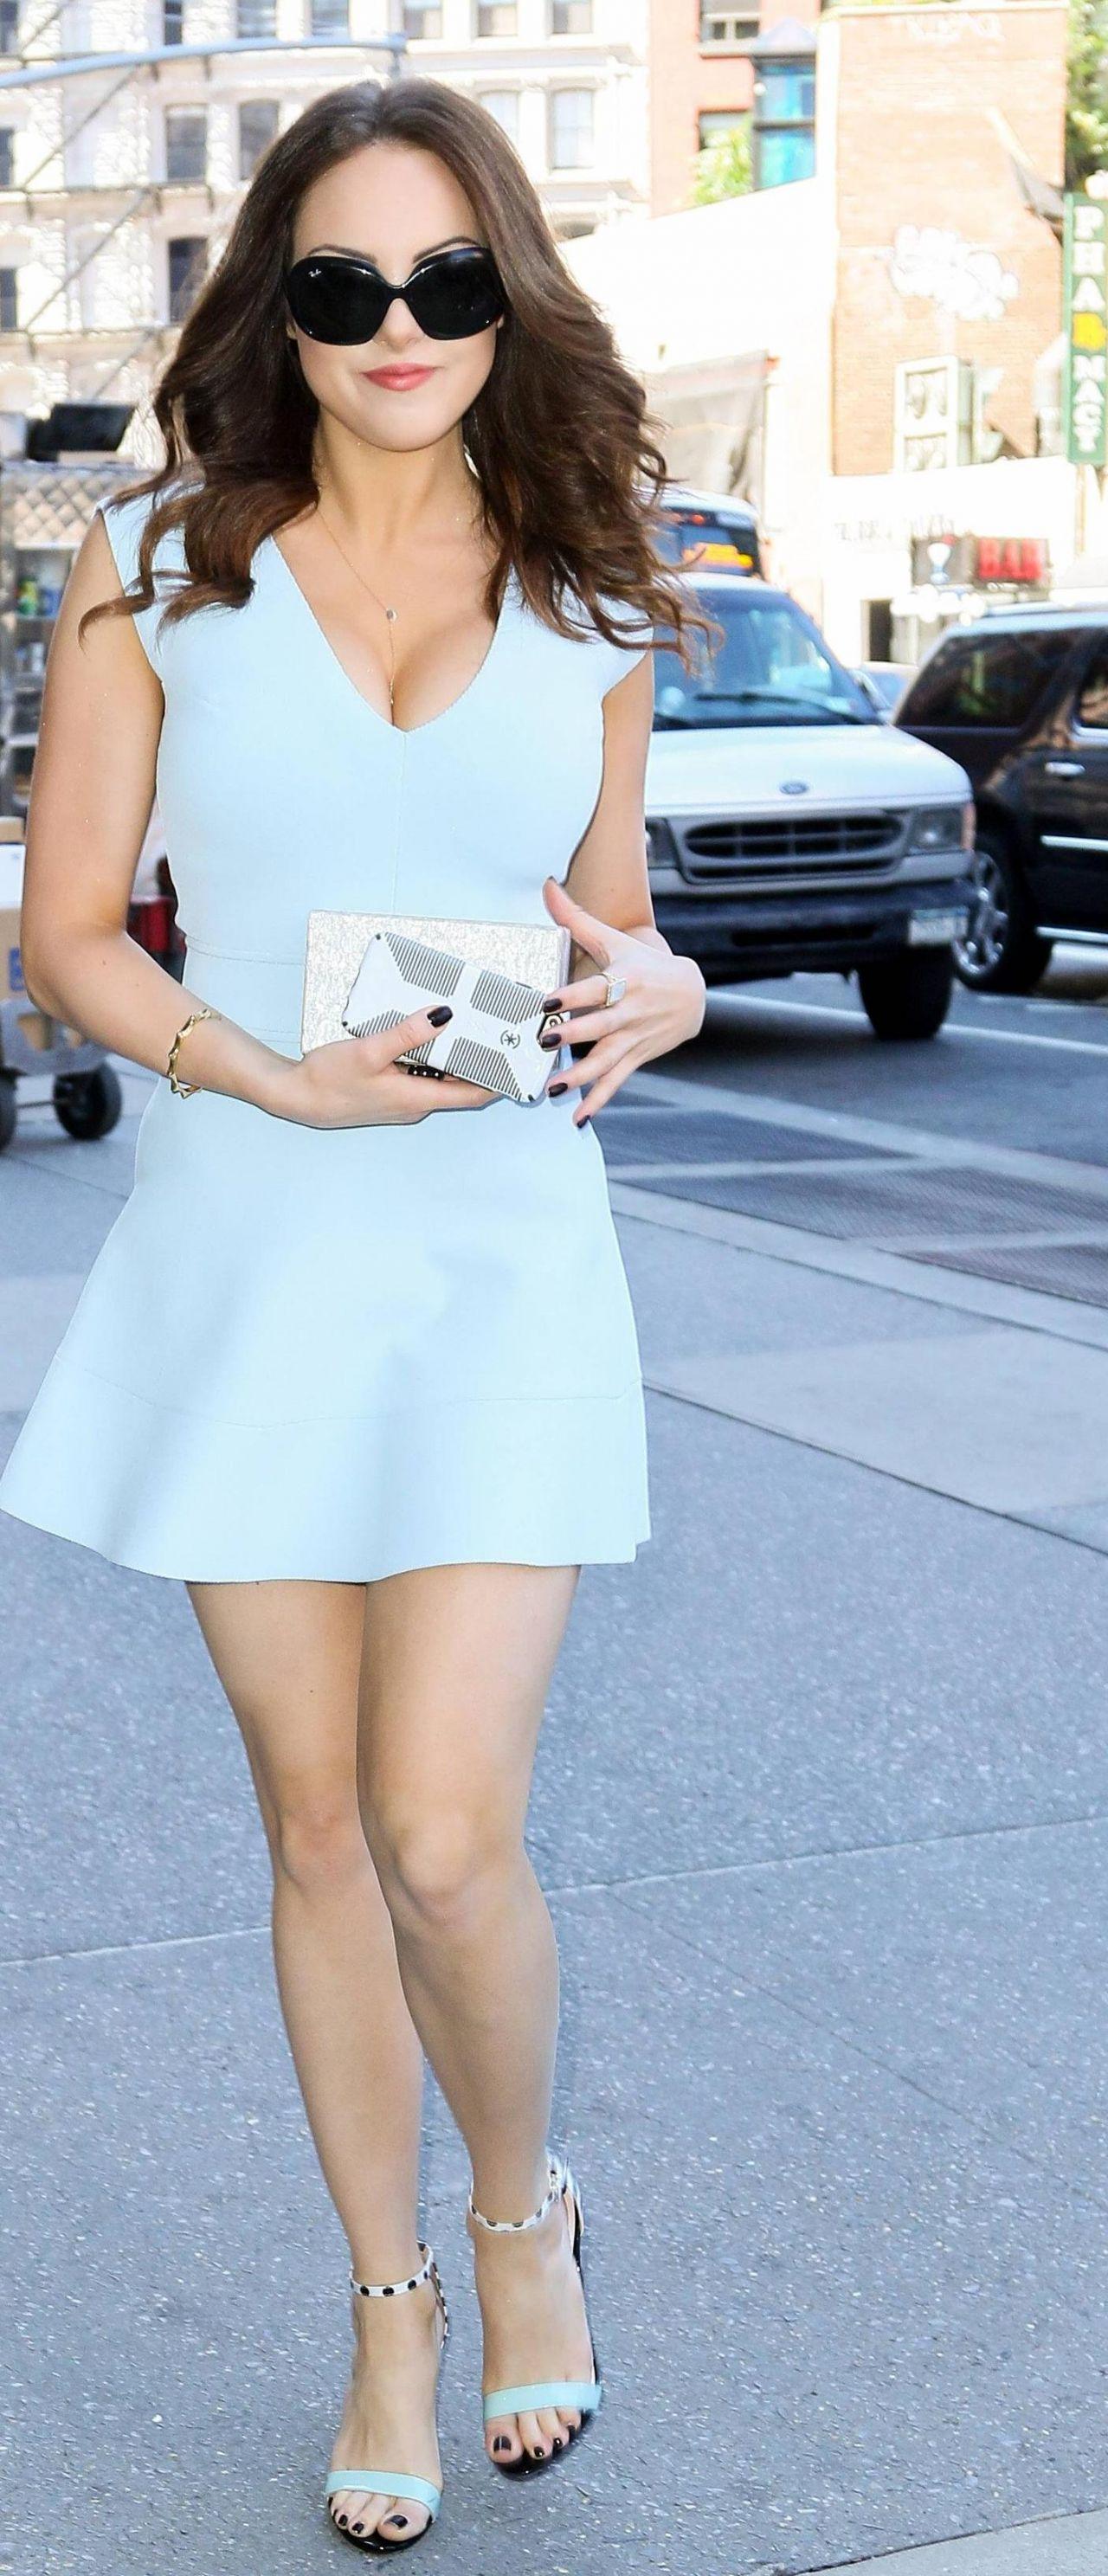 Elizabeth Gillies In Mini Dress June 2015